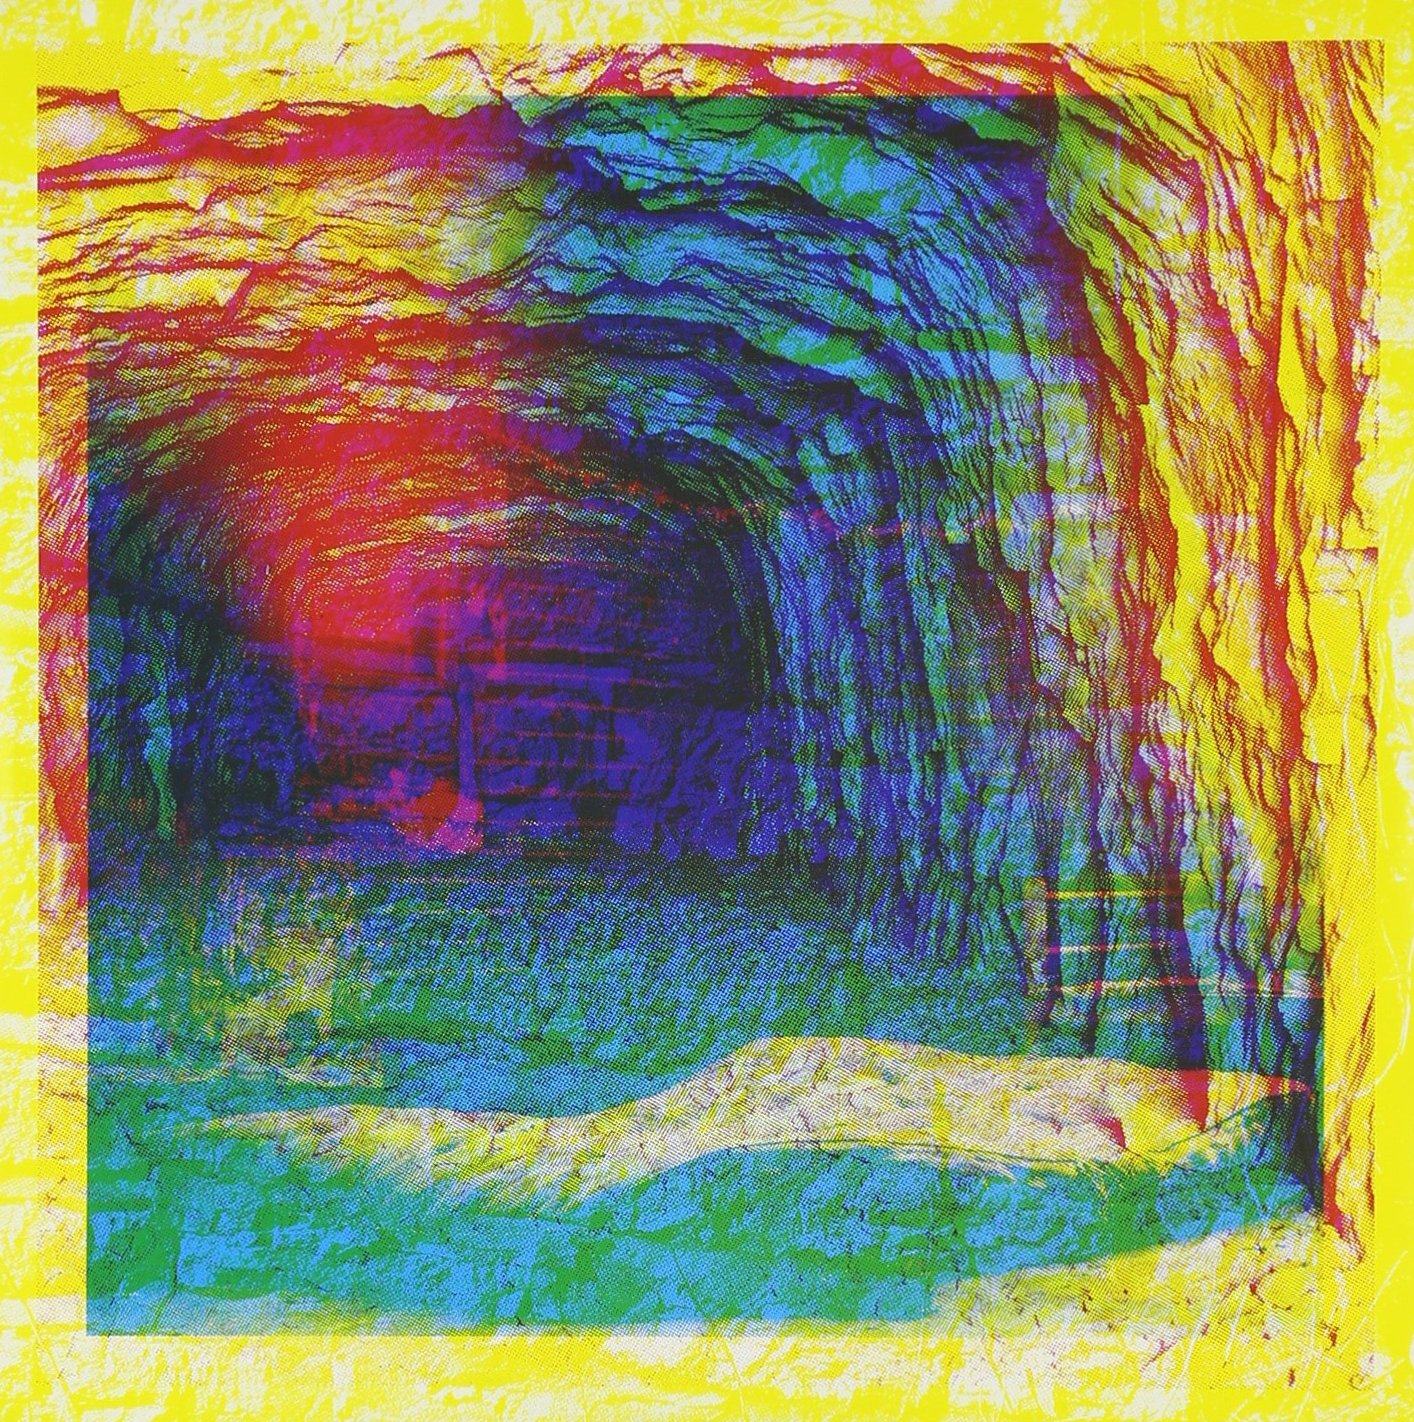 CD : Gauntlet Hair - My Christ (7 Inch Single)